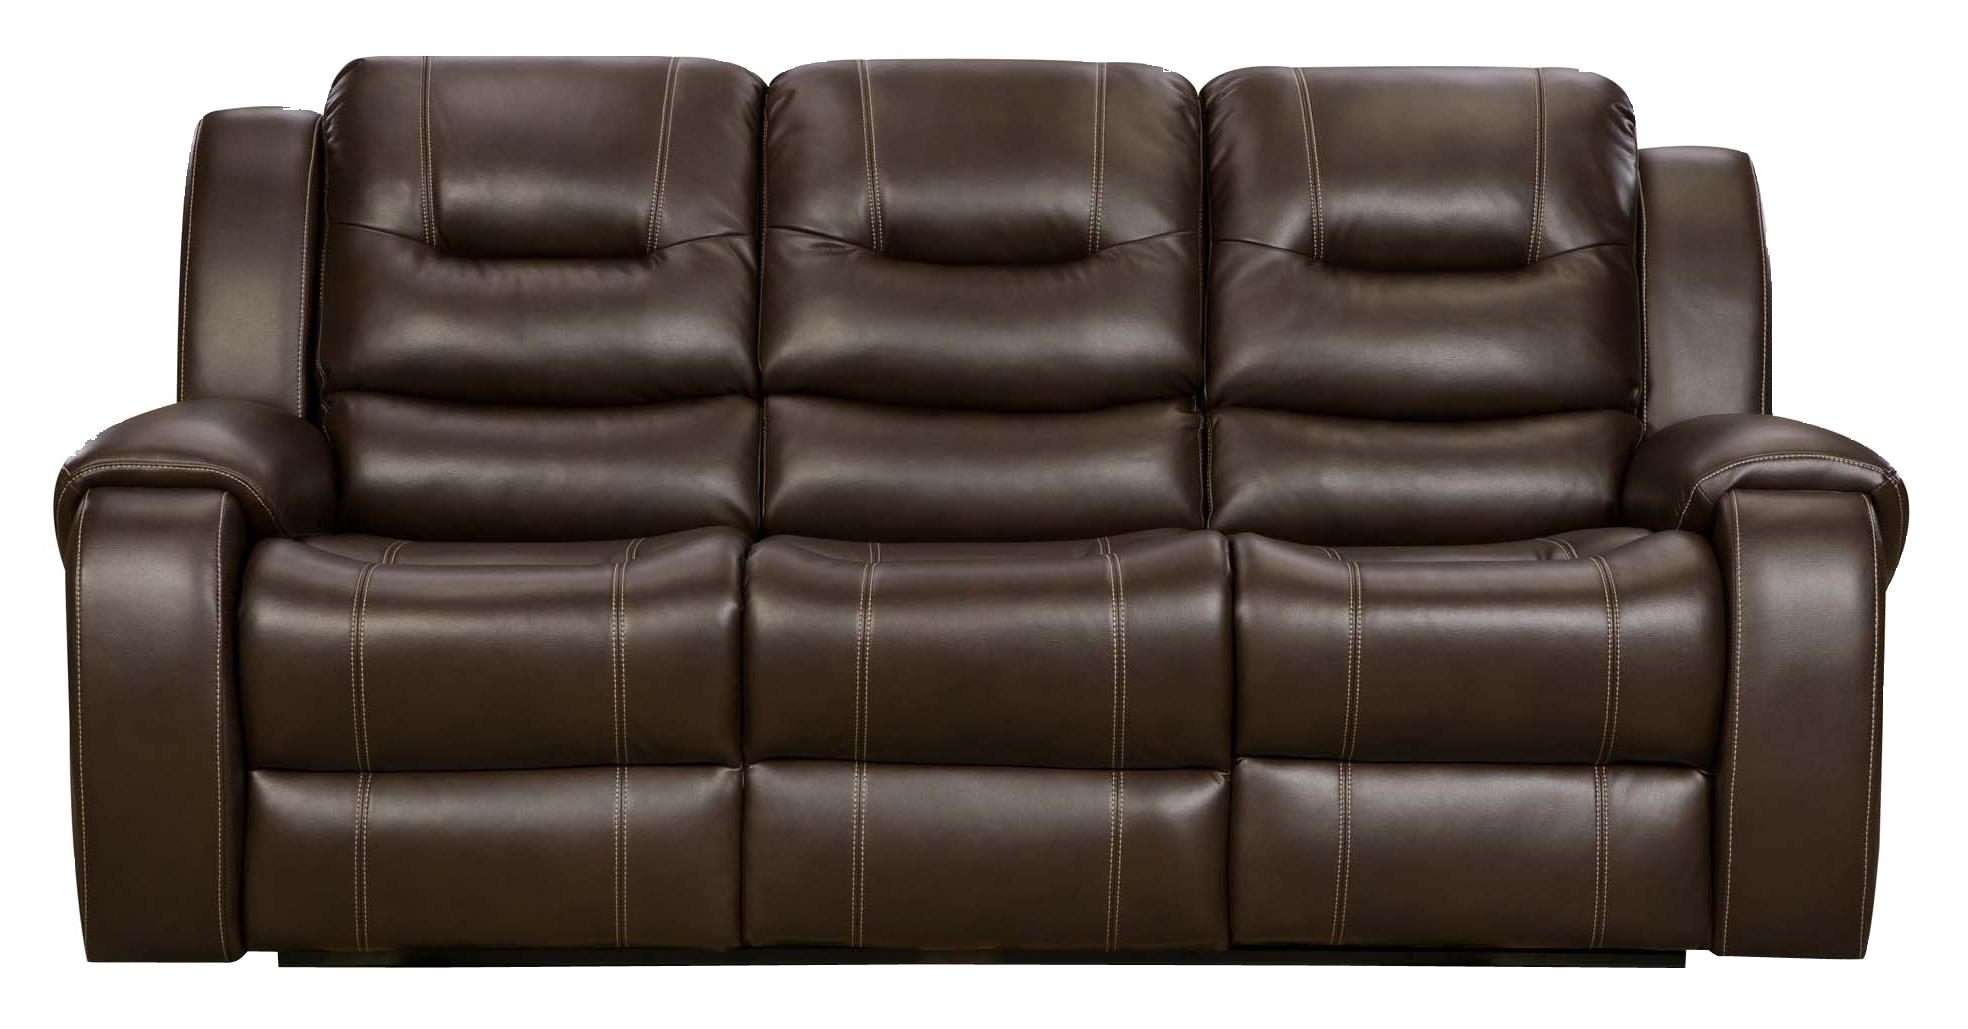 Madison Reclining Sofa at Belfort Furniture